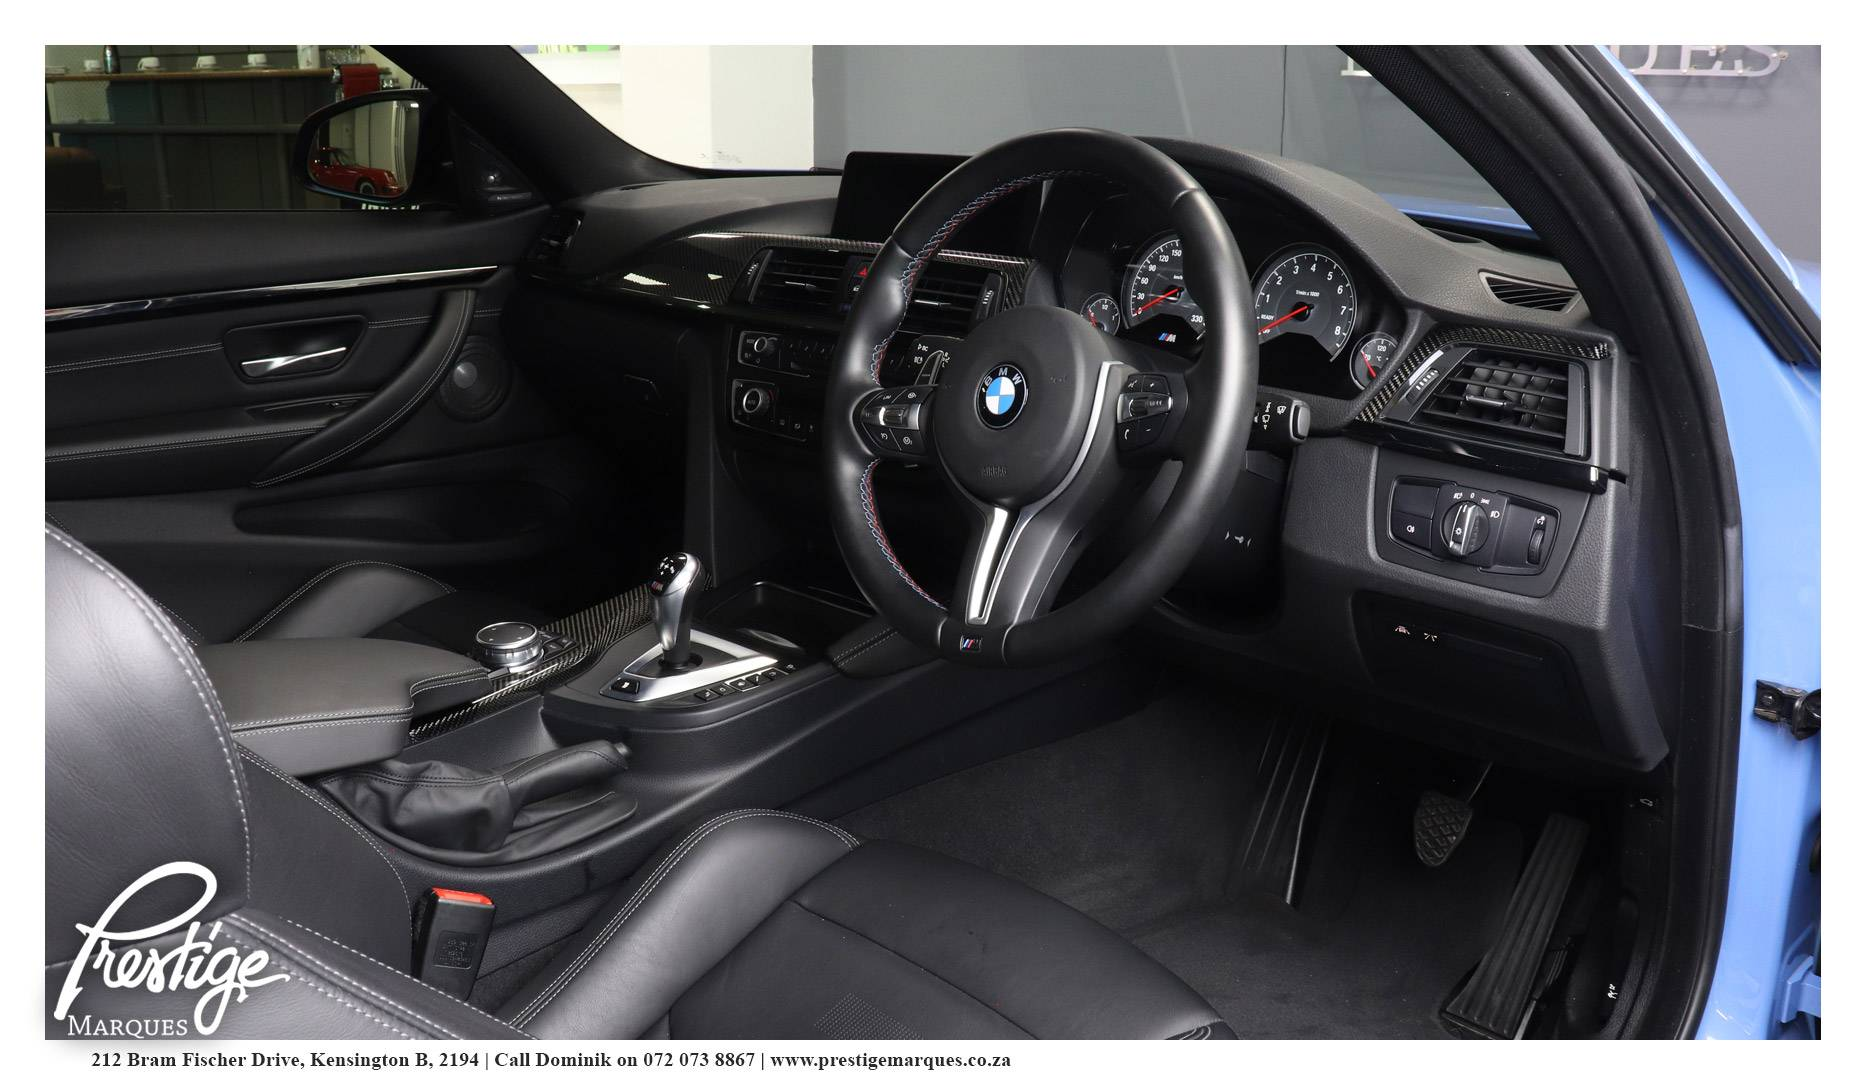 2015-BMW-M4-Coupe-Blue-Prestige-Marques-Randburg-Sandton-14